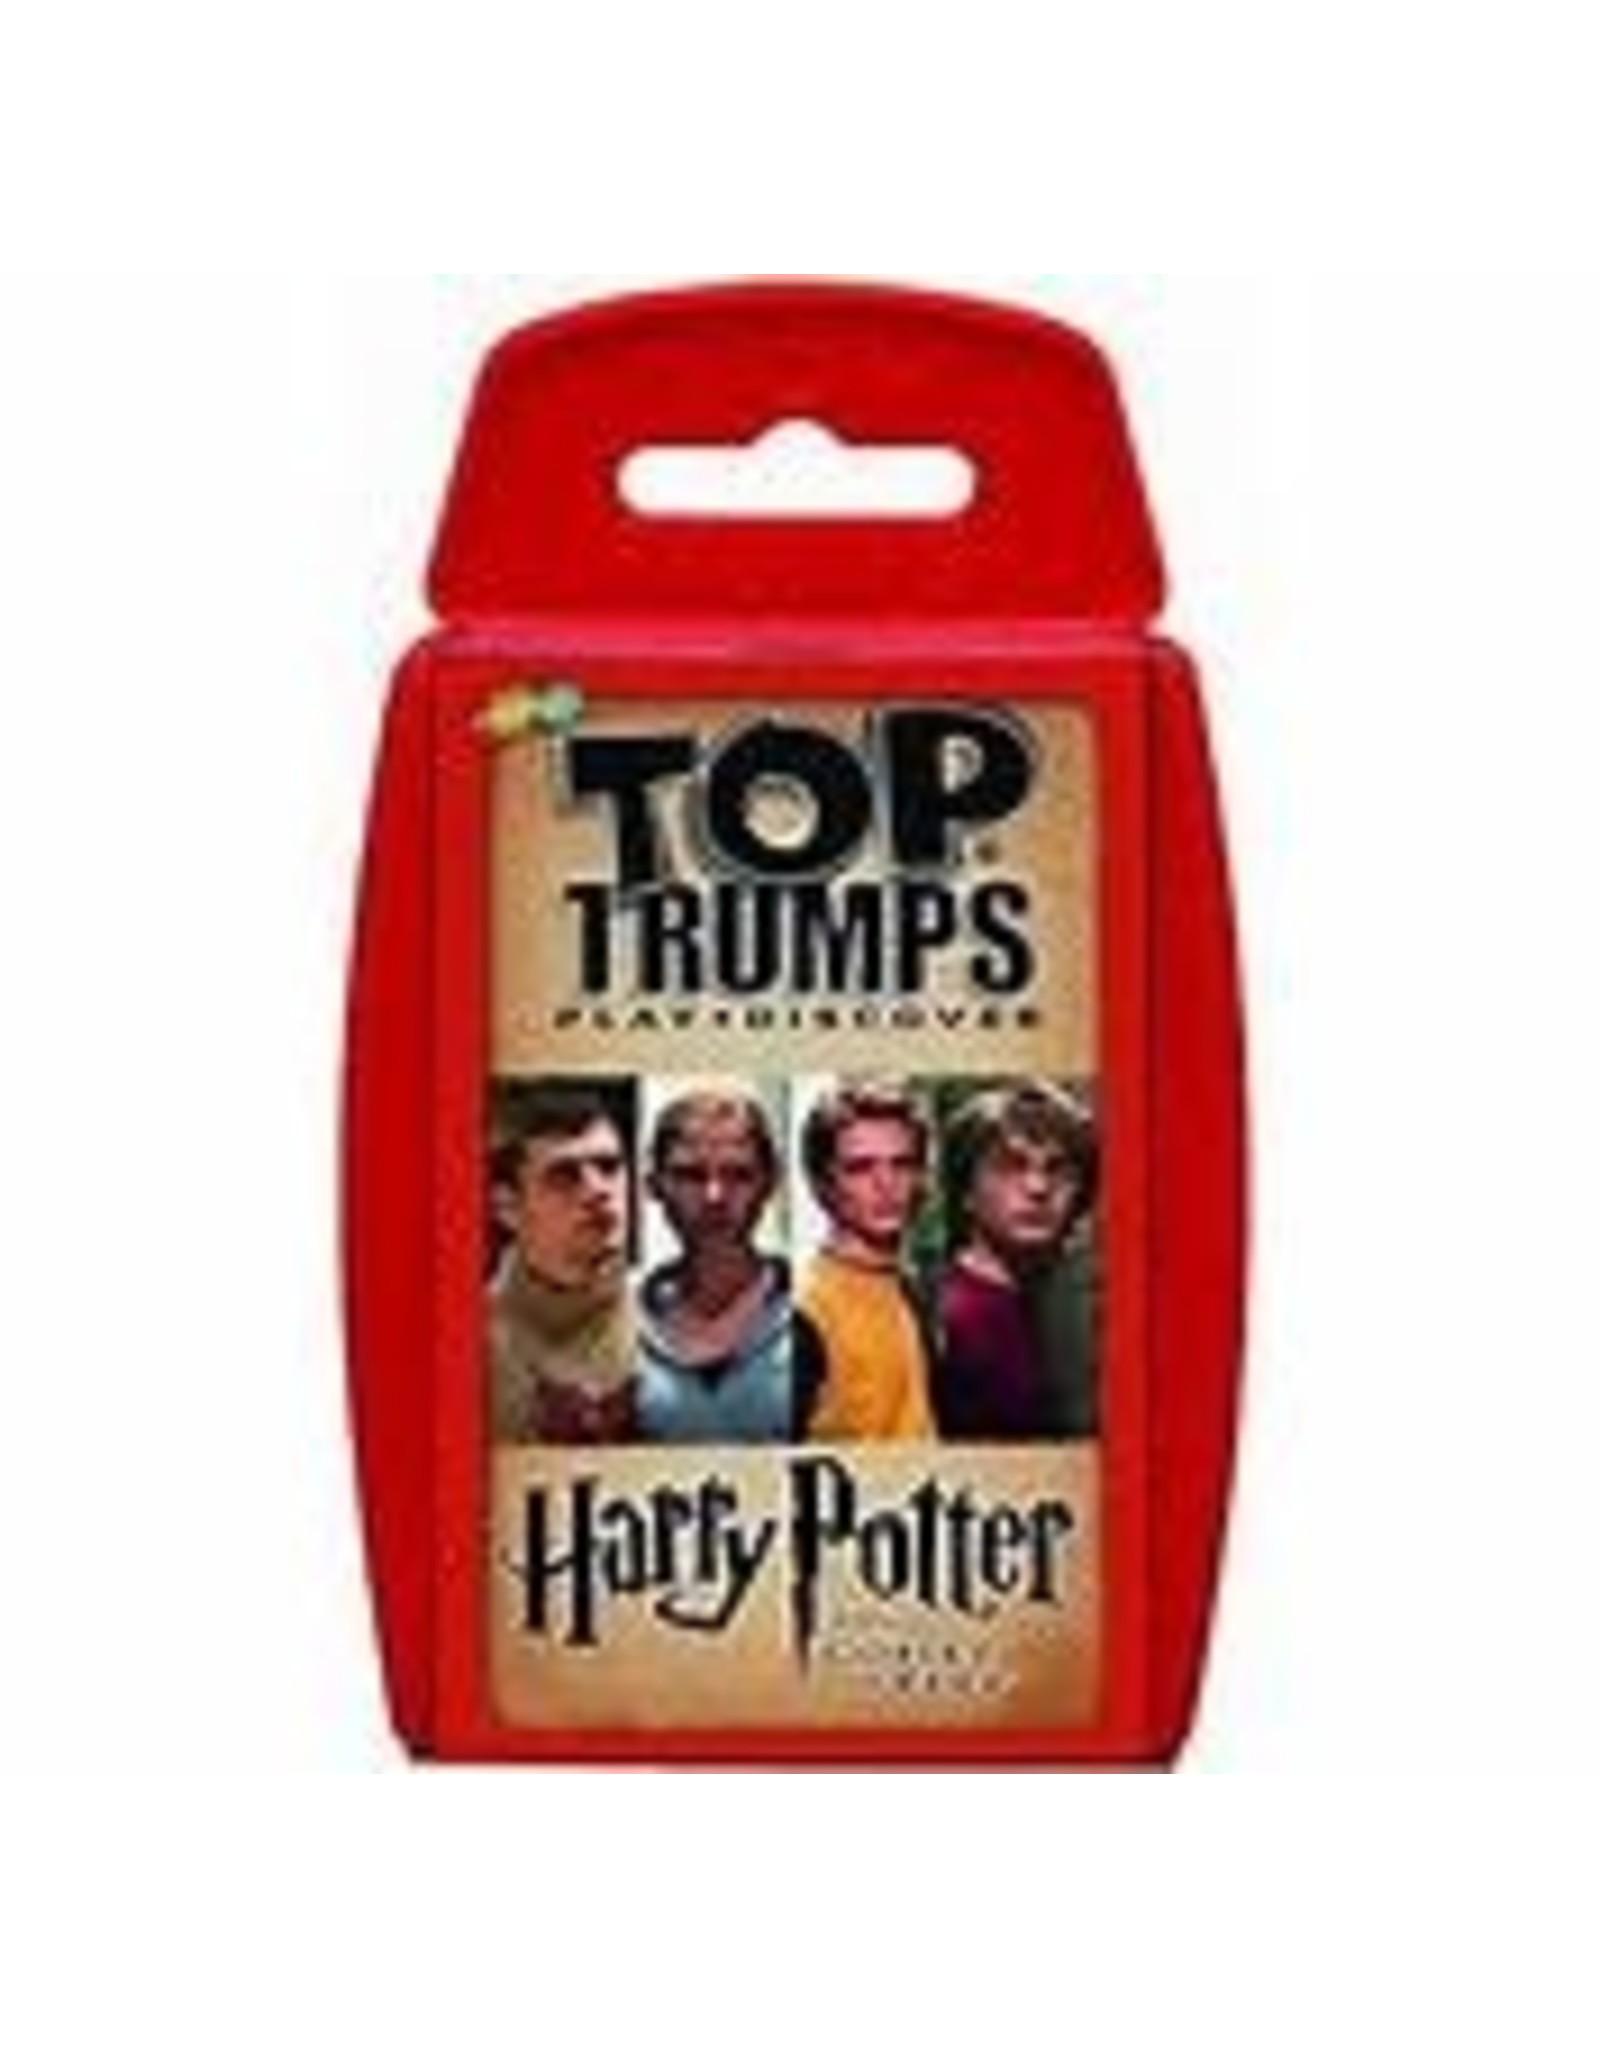 Top Trumps Harry Potter & The Goblet Of Fire Top Trump